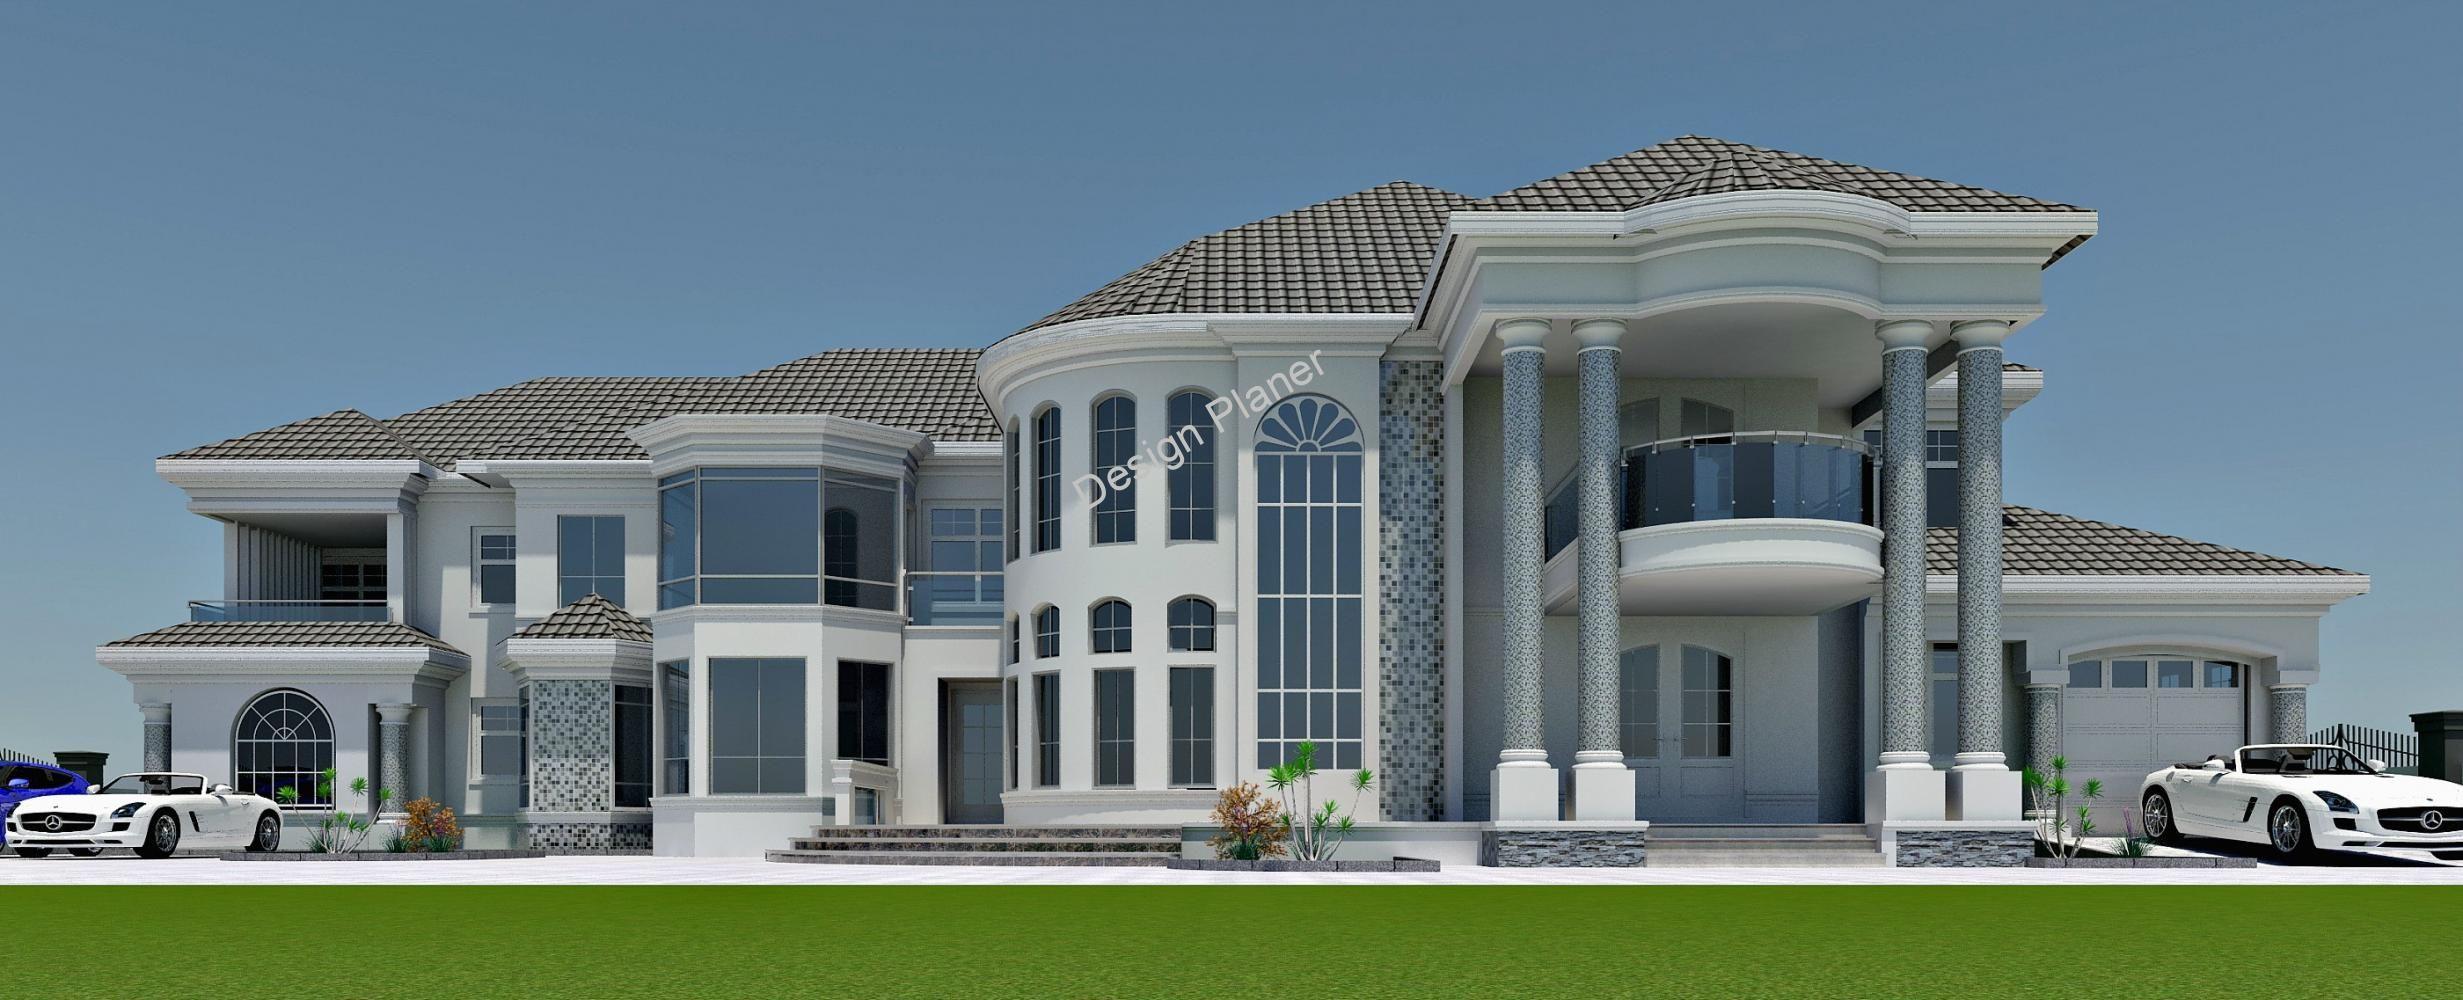 10 Bedroom House Modern Style House Plans Luxury House Floor